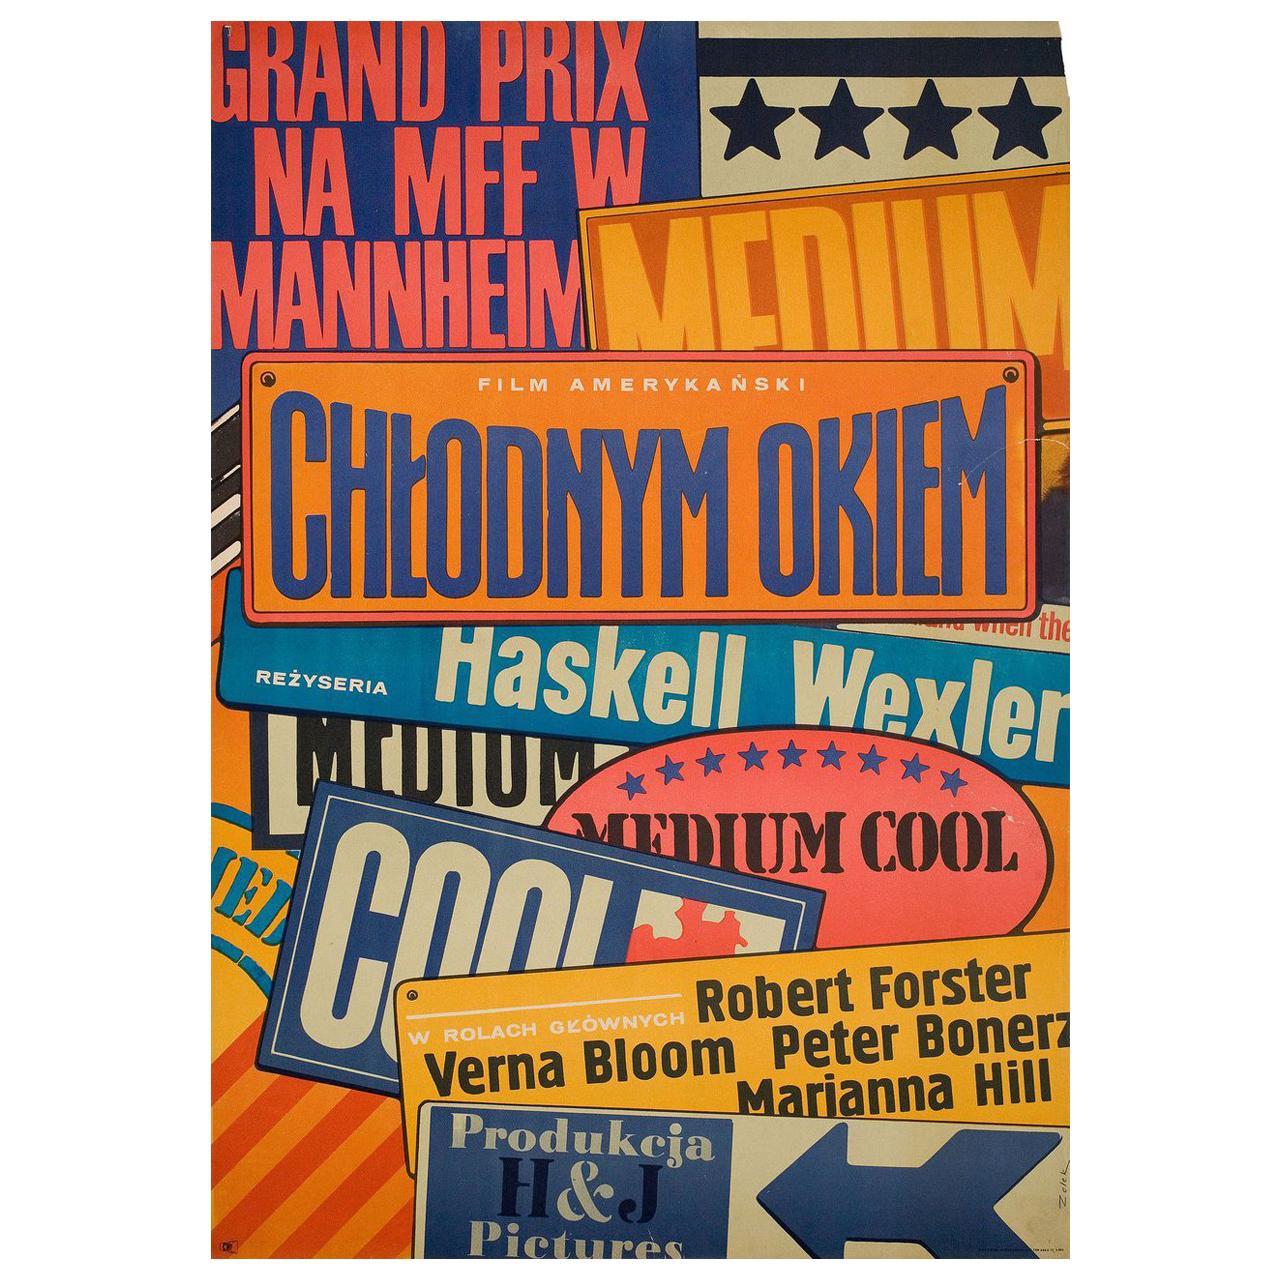 Medium Cool 1969 Polish A1 Film Poster